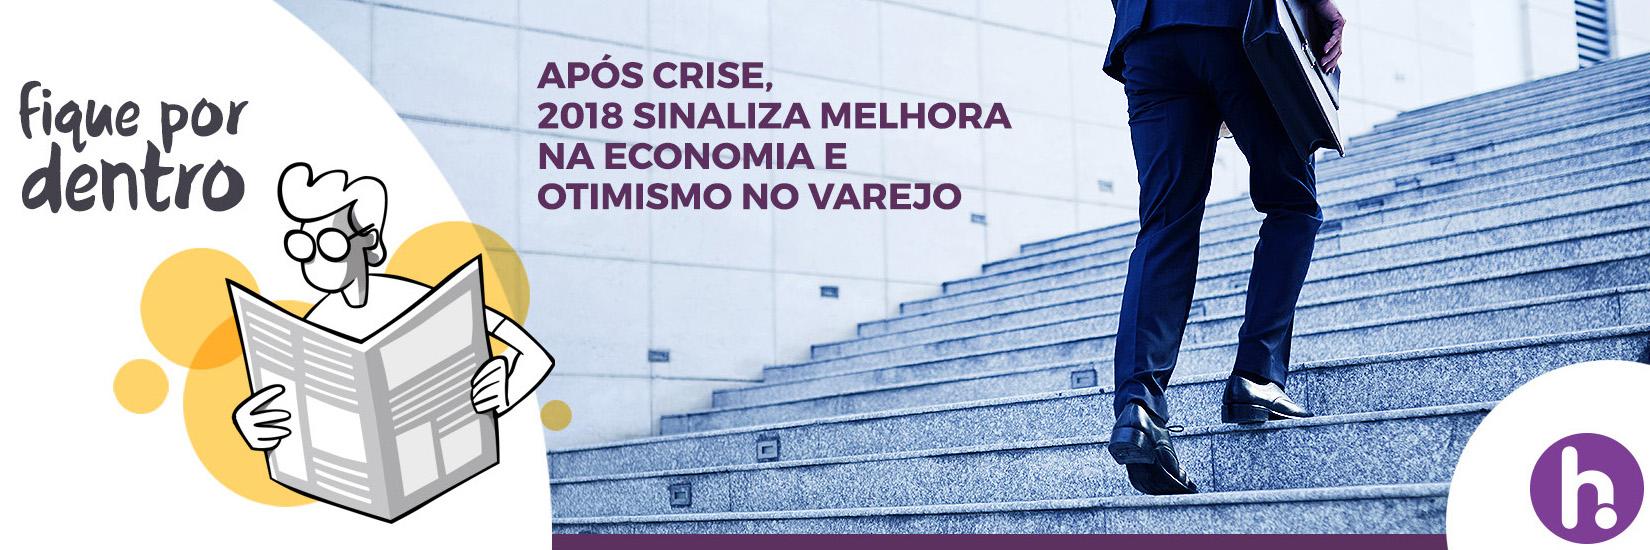 Após crise, 2018 sinaliza melhora na economia e otimismo no varejo.